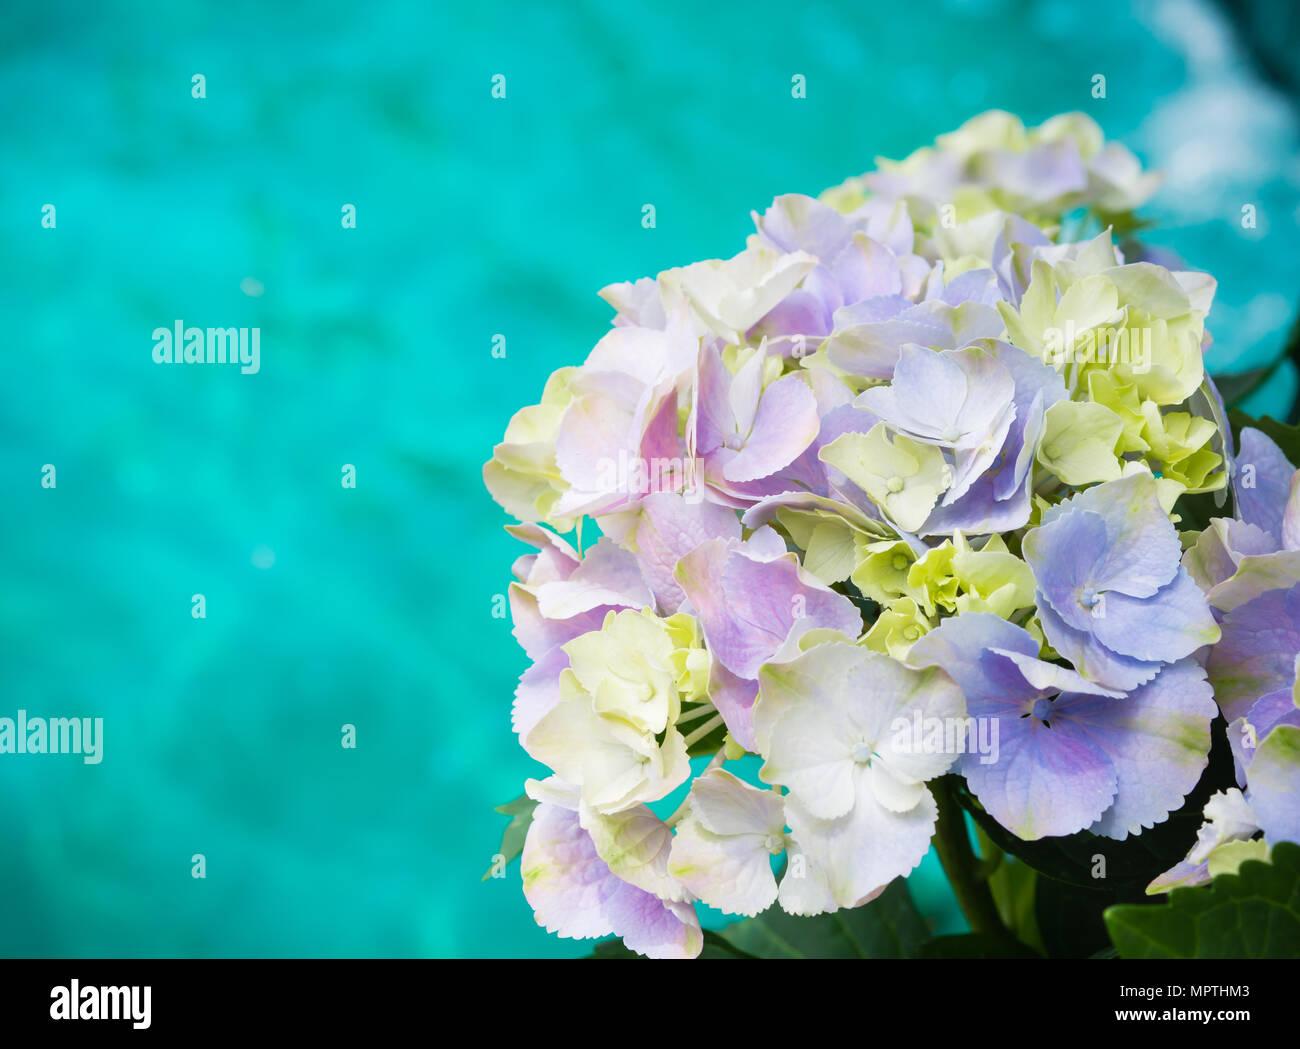 Close up purple white hydrangea paniculata limelight flowers with close up purple white hydrangea paniculata limelight flowers with blue water background izmirmasajfo